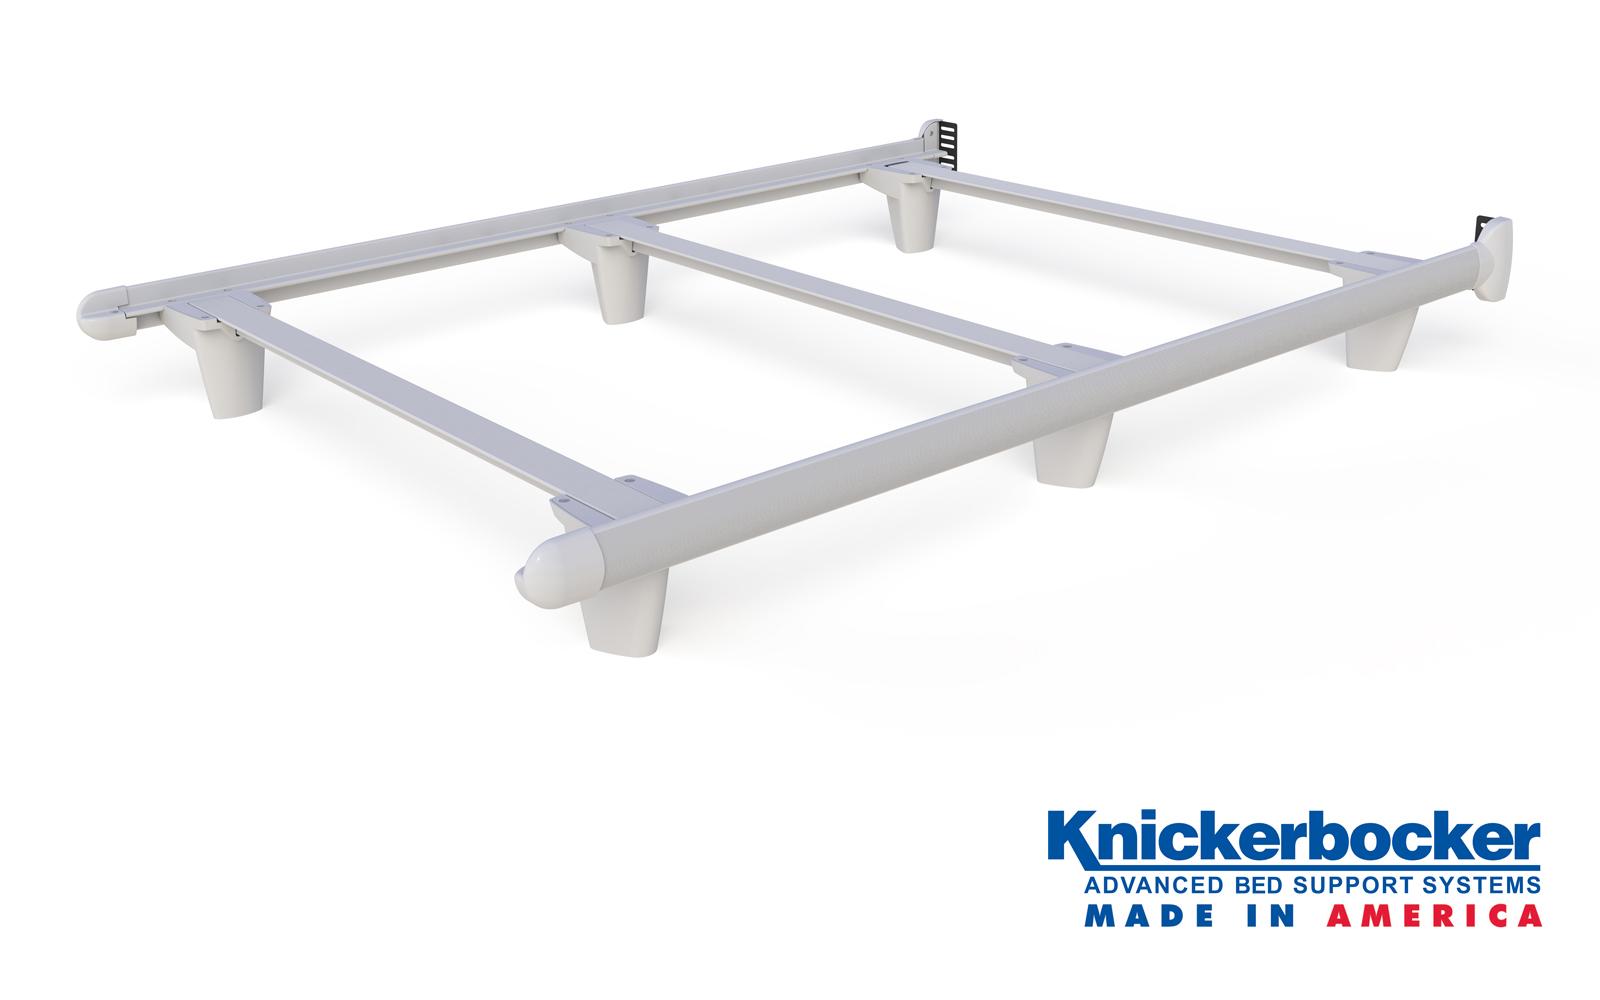 Full Embrace Bed Frame Knickerbocker Bed Frame Company